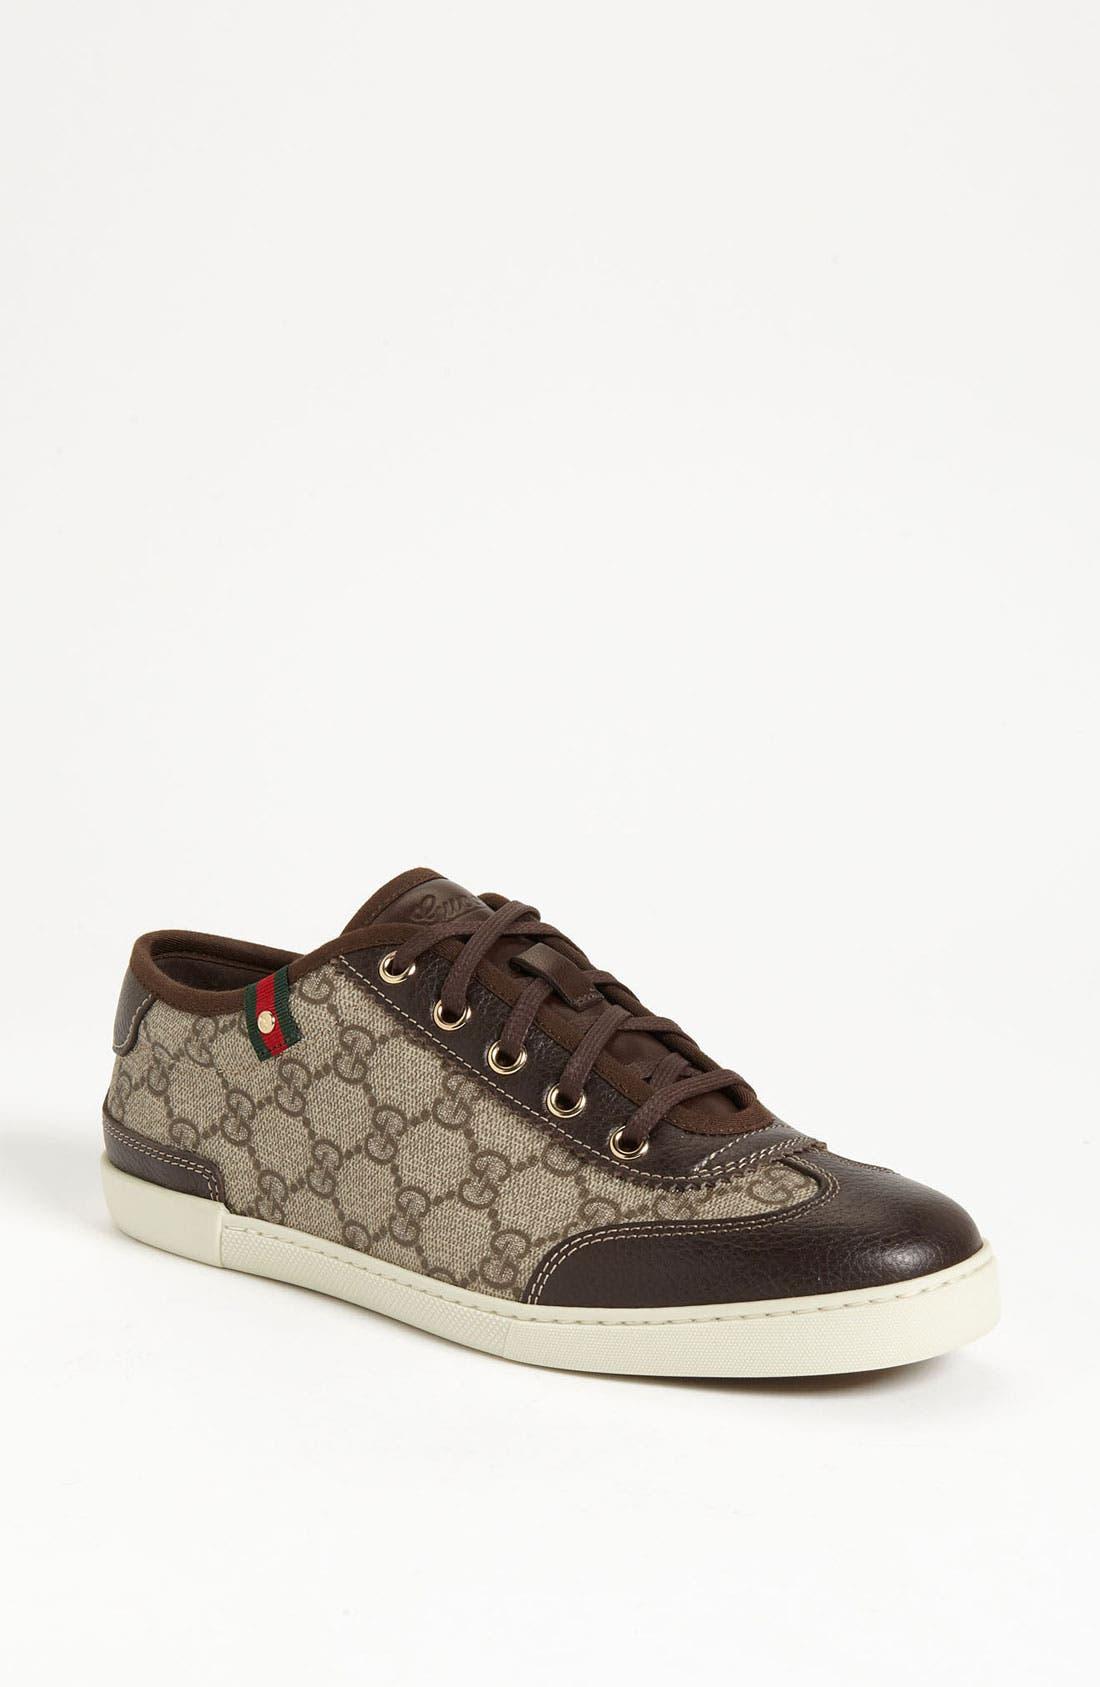 Main Image - Gucci 'Barcelona' Sneaker